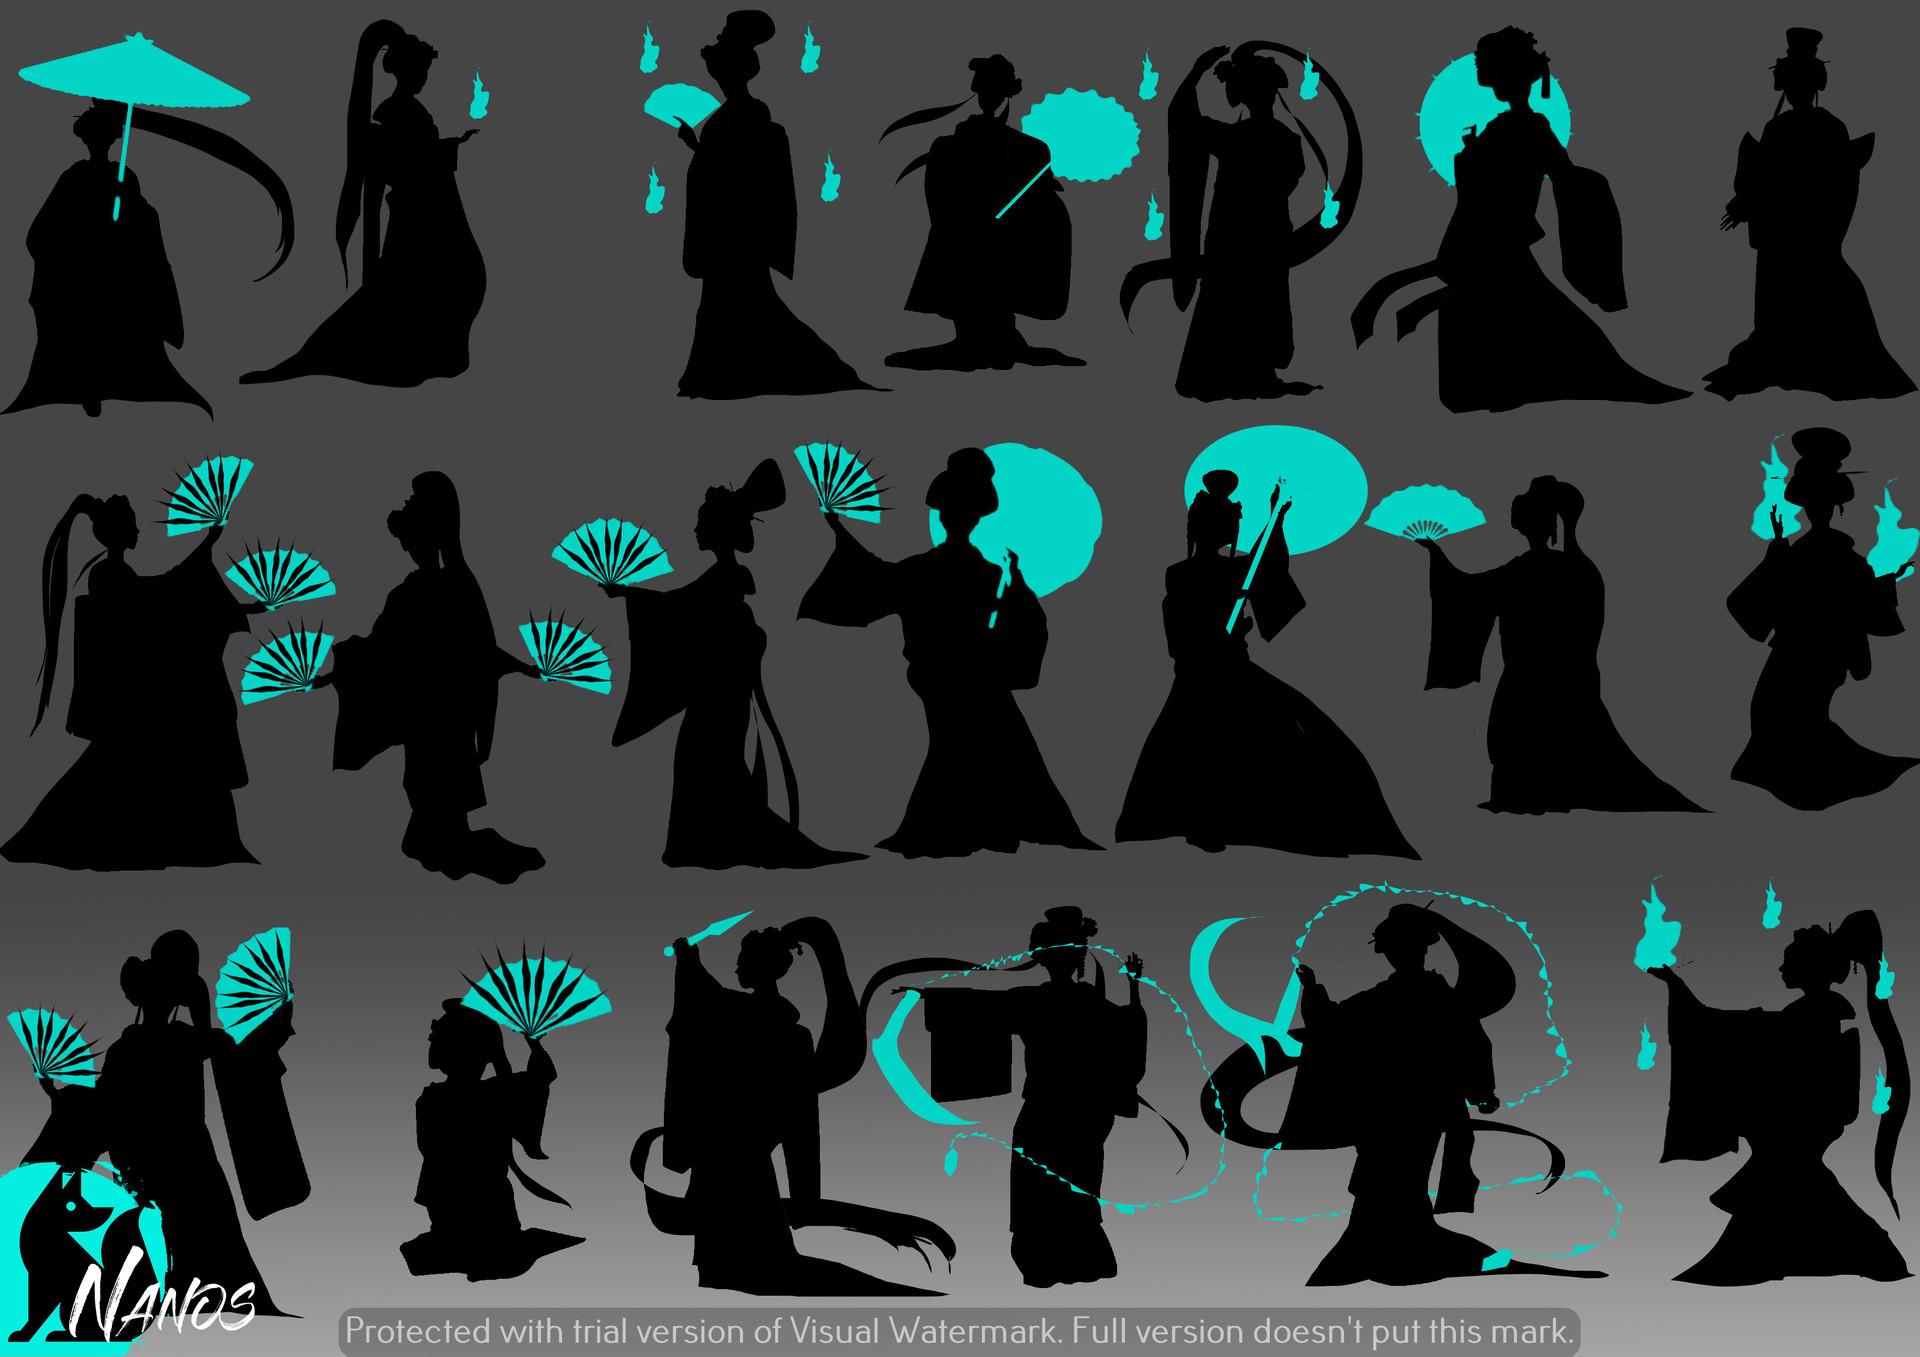 ArtStation - Lady Seinharu Kitsune Silhouette - Enigma, Sophie